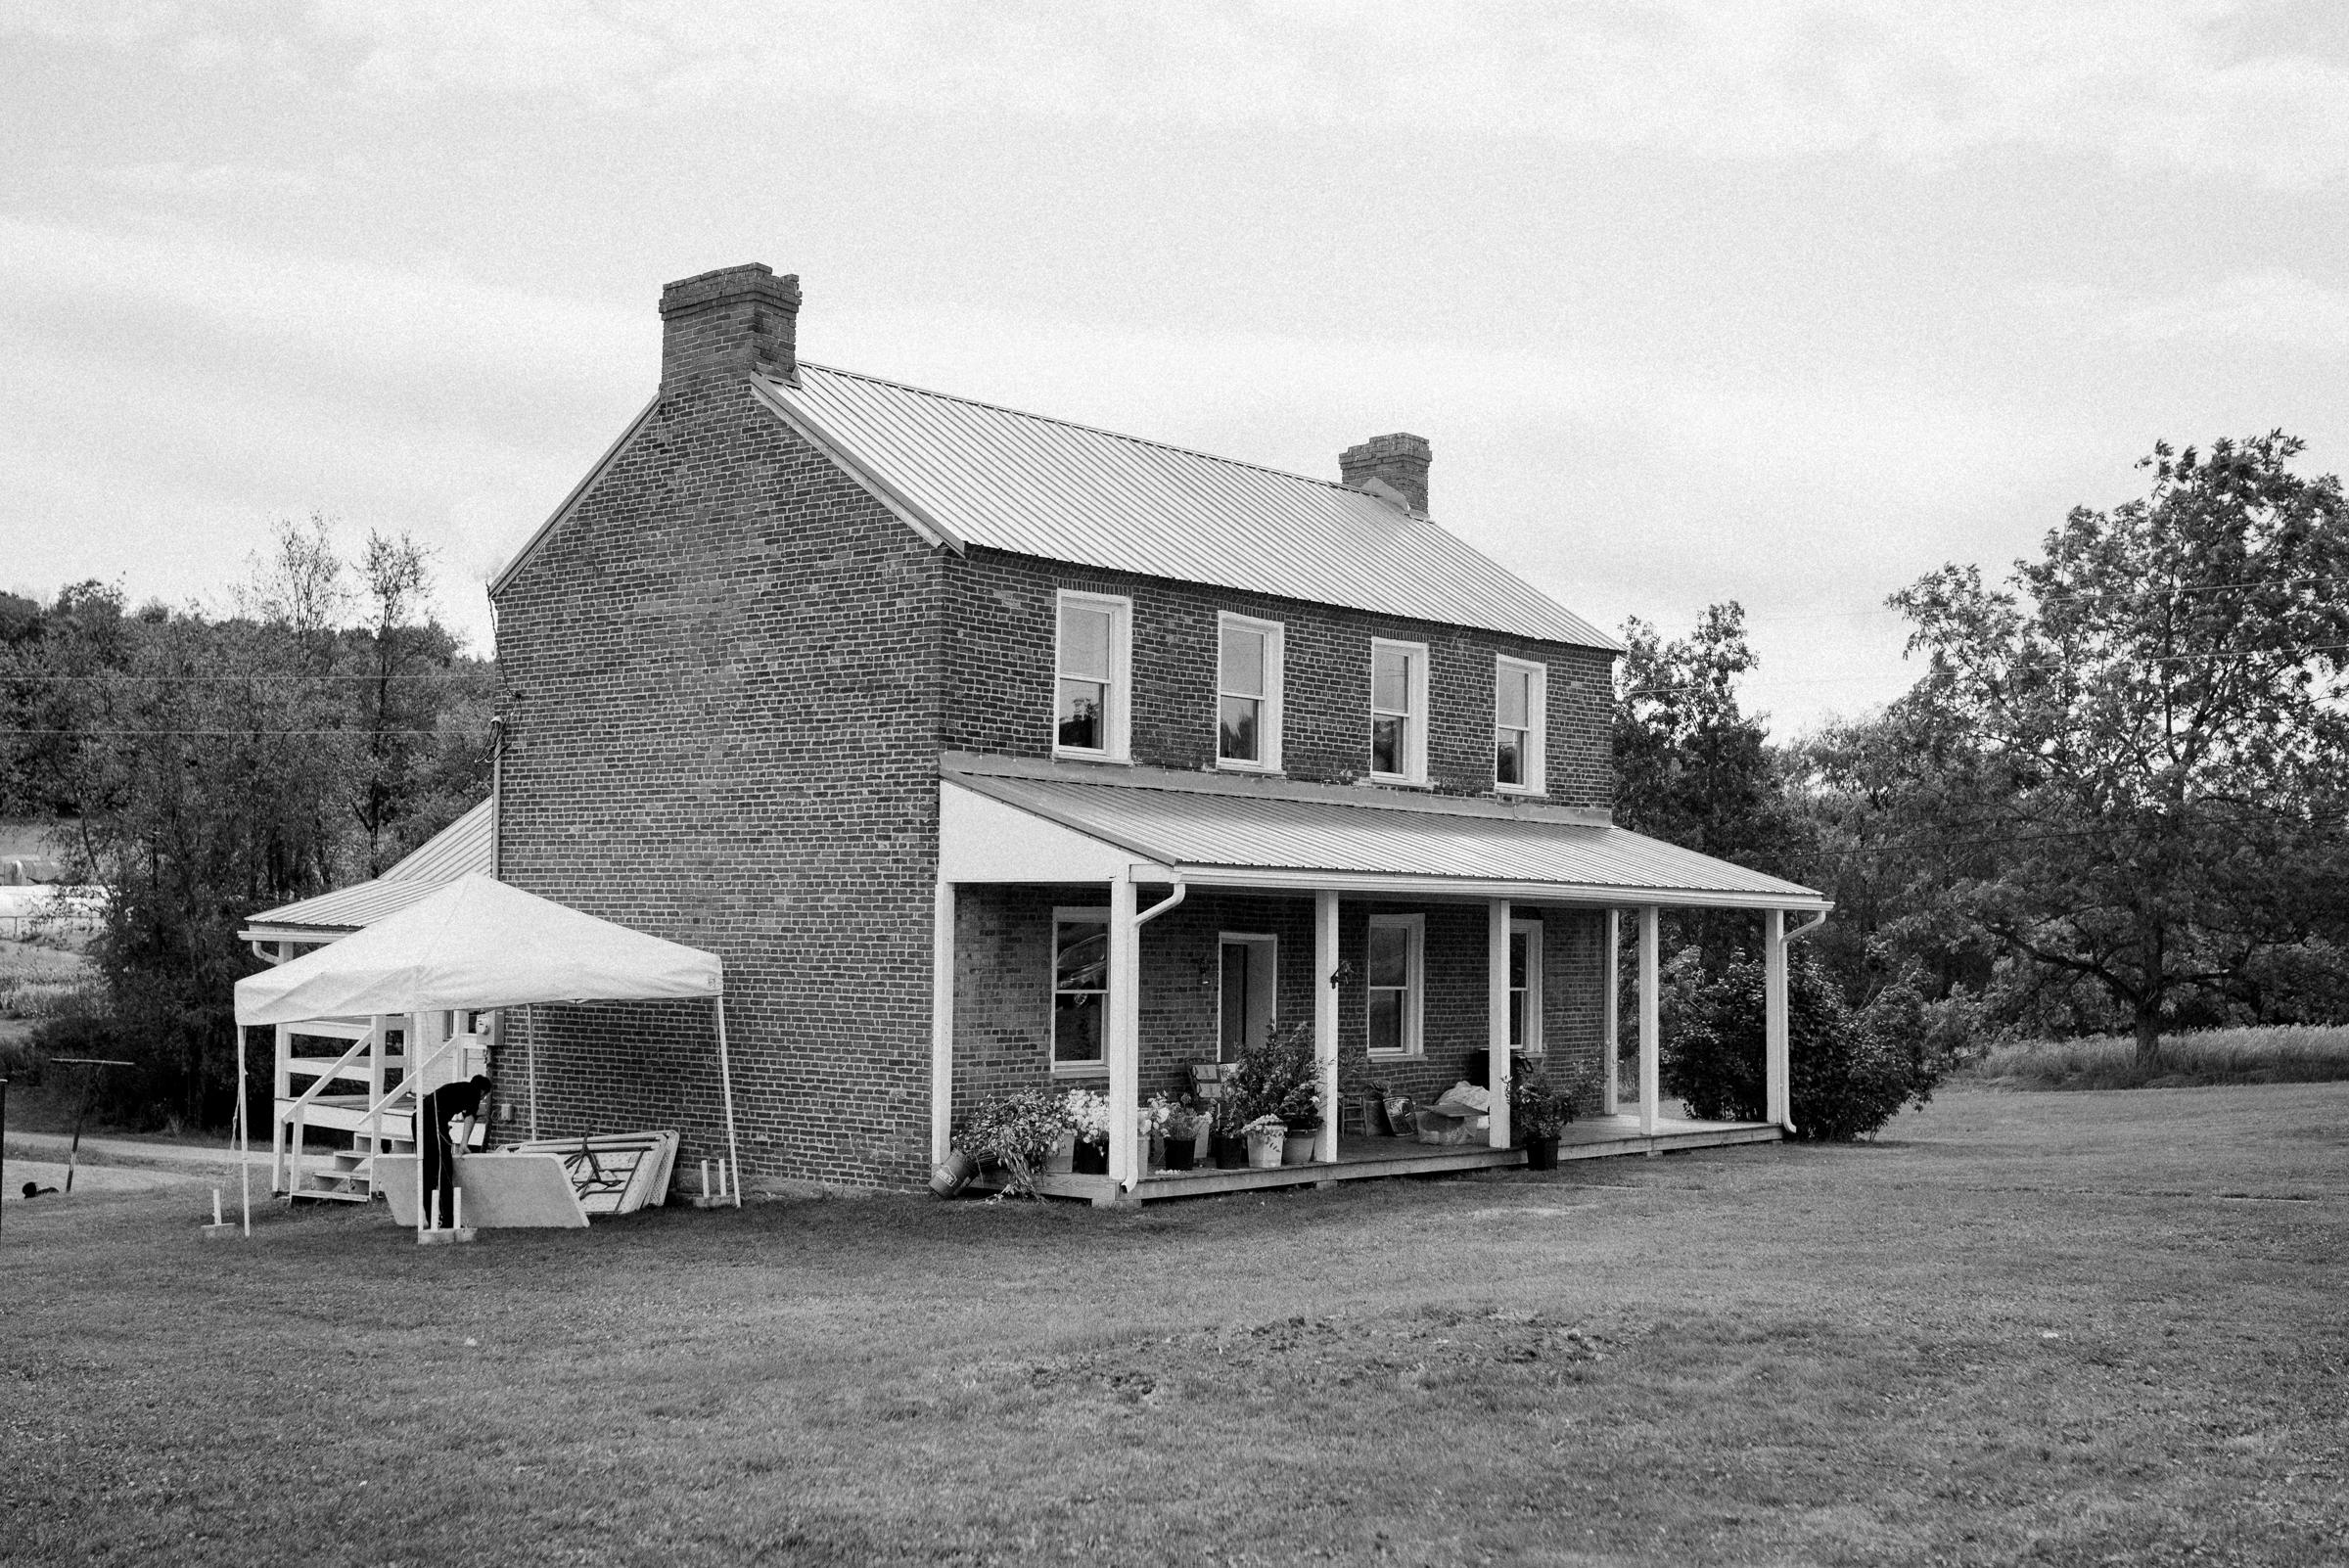 pittsburgh-wedding-photographer-garden-wedding-bumbleburgh-pennsylvania-elegant-wedding-1.jpg